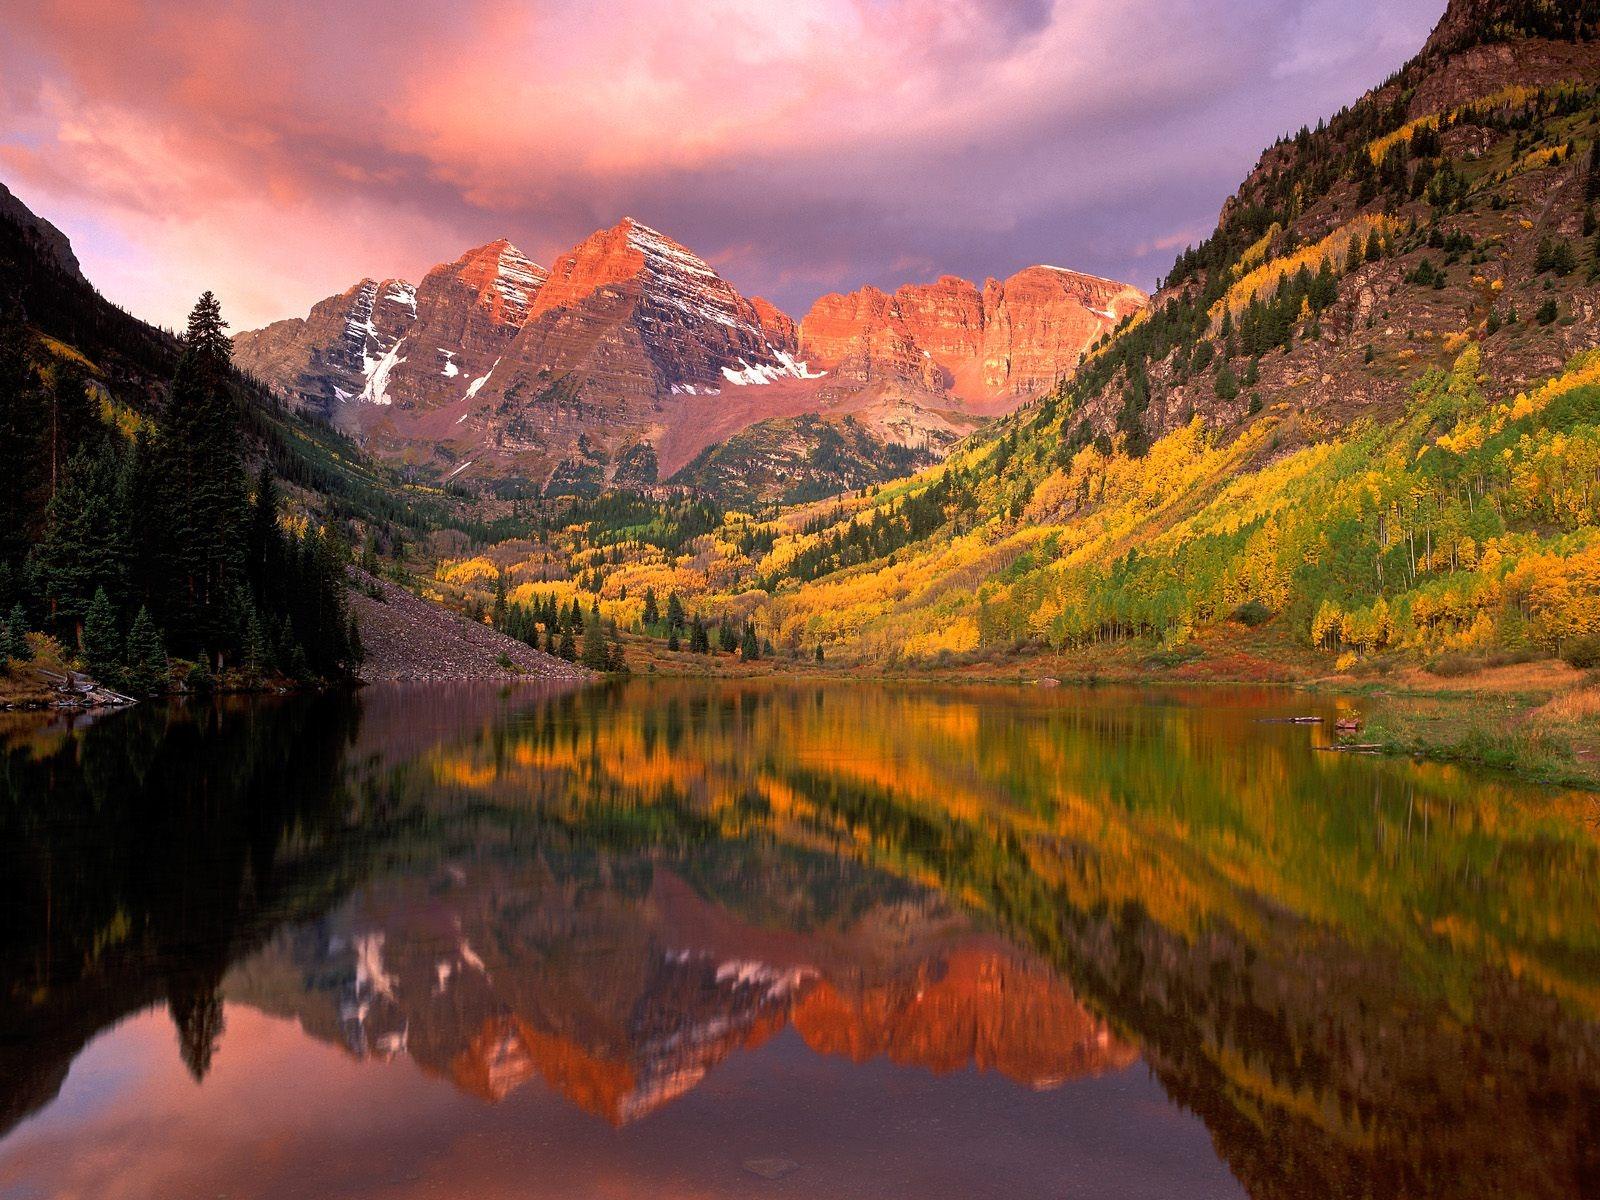 Fall Mountain Wallpapers High Quality : Nature Wallpaper - Dudaite com